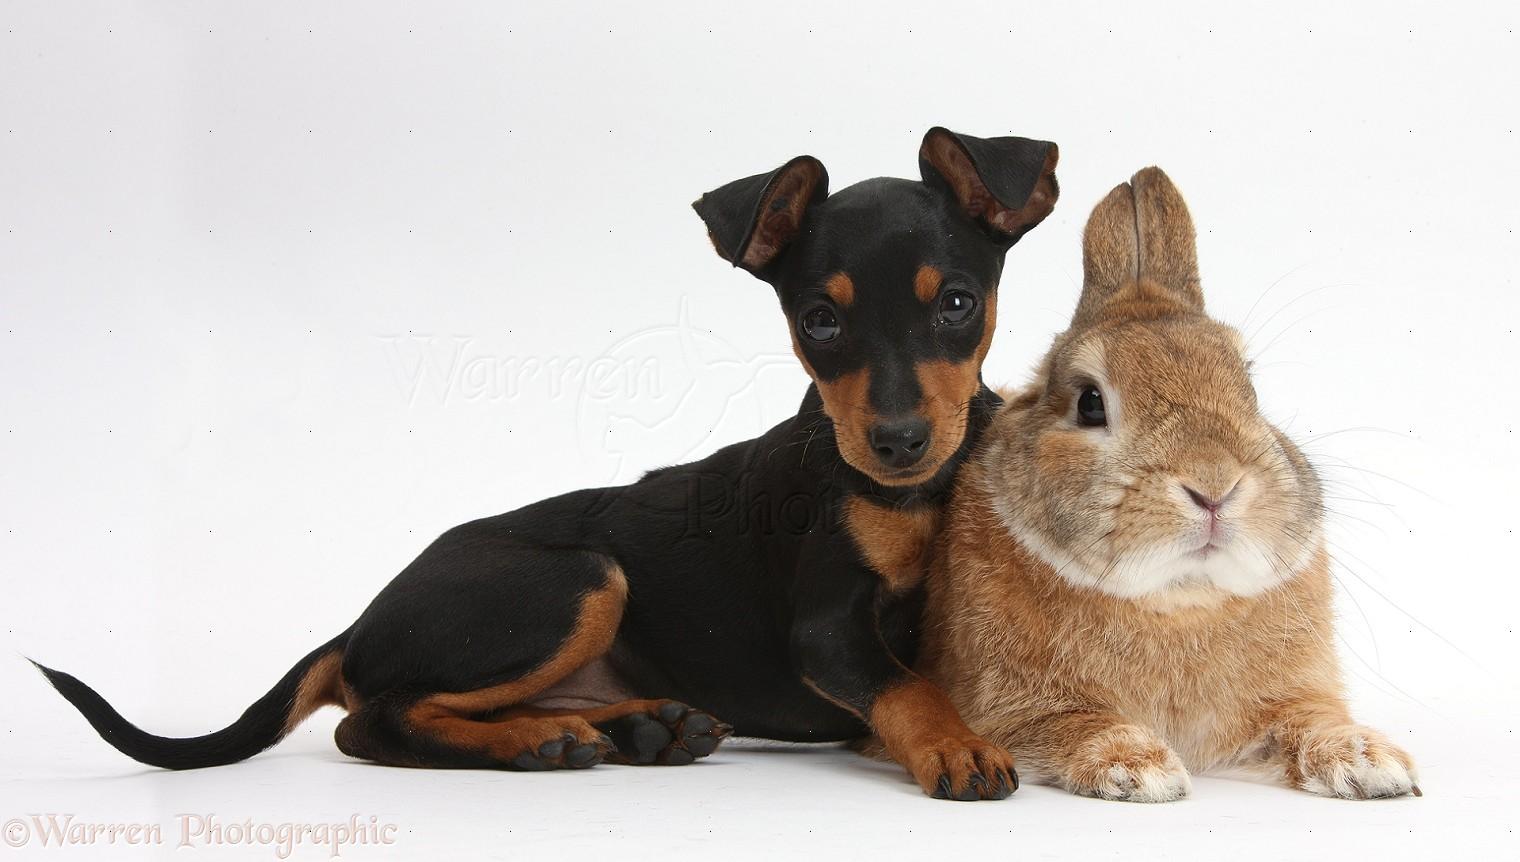 Pets Miniature Pinscher Puppy And Rabbit Photo Wp36114